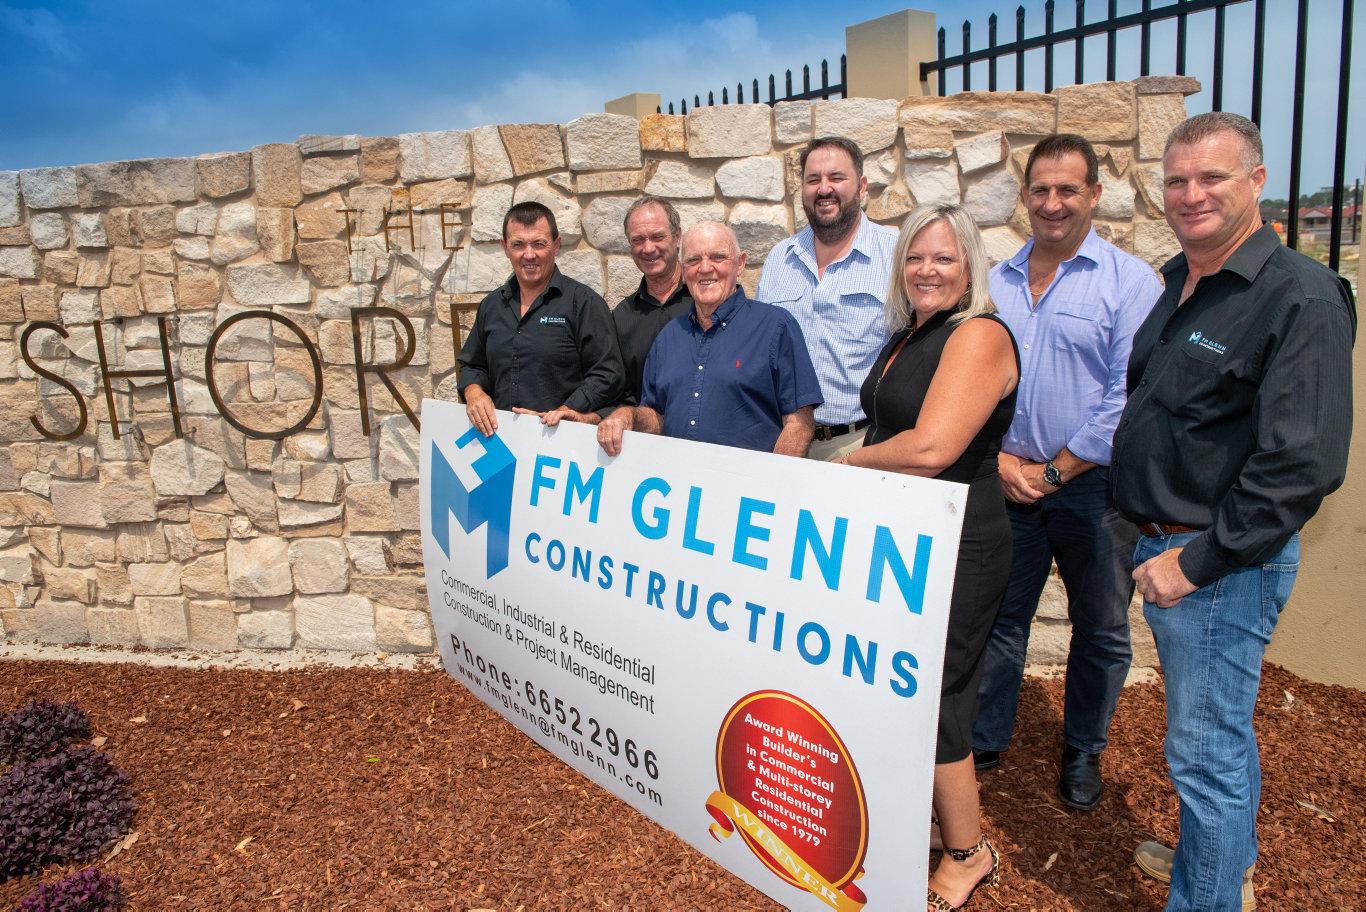 THE BIGGEST EVER: FM Glenn's Robert Norton, Kevin Hartley, Max Glenn with Steve Gooley Bachrach Naumburger Group, Maree Spencer FM Glenn, Mick Carah BNG Group and Craig Spencer, FM Glenn.